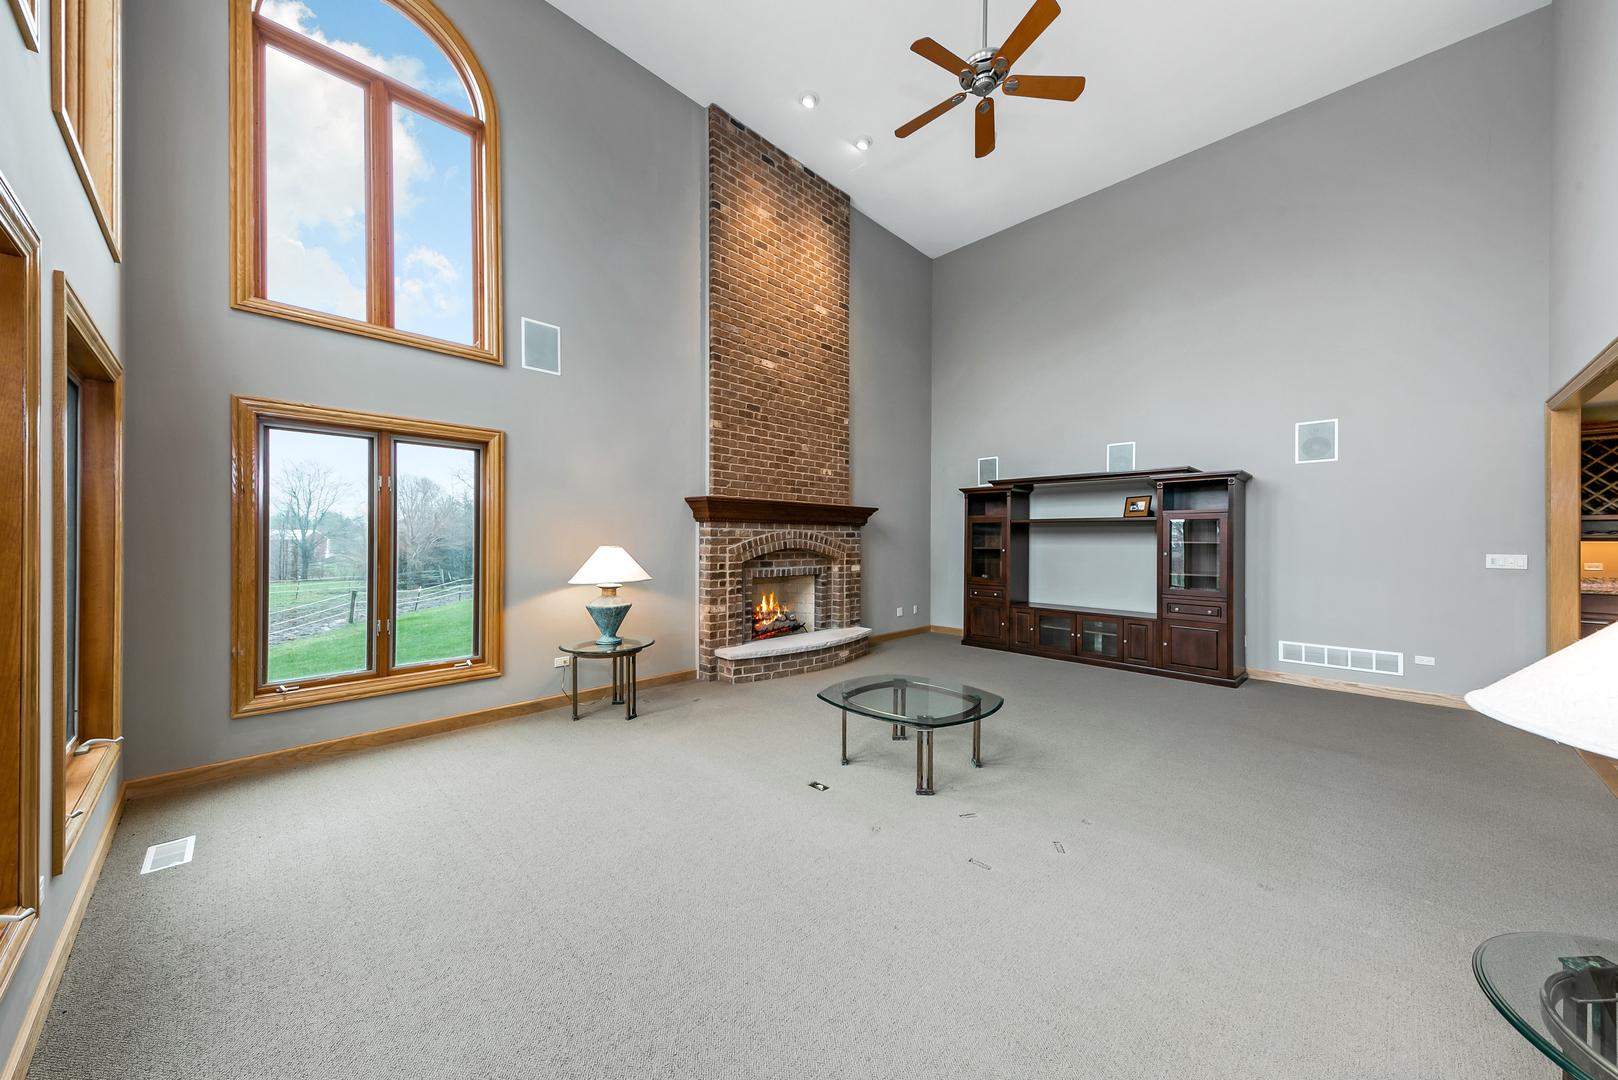 25728 West 119th, PLAINFIELD, Illinois, 60585